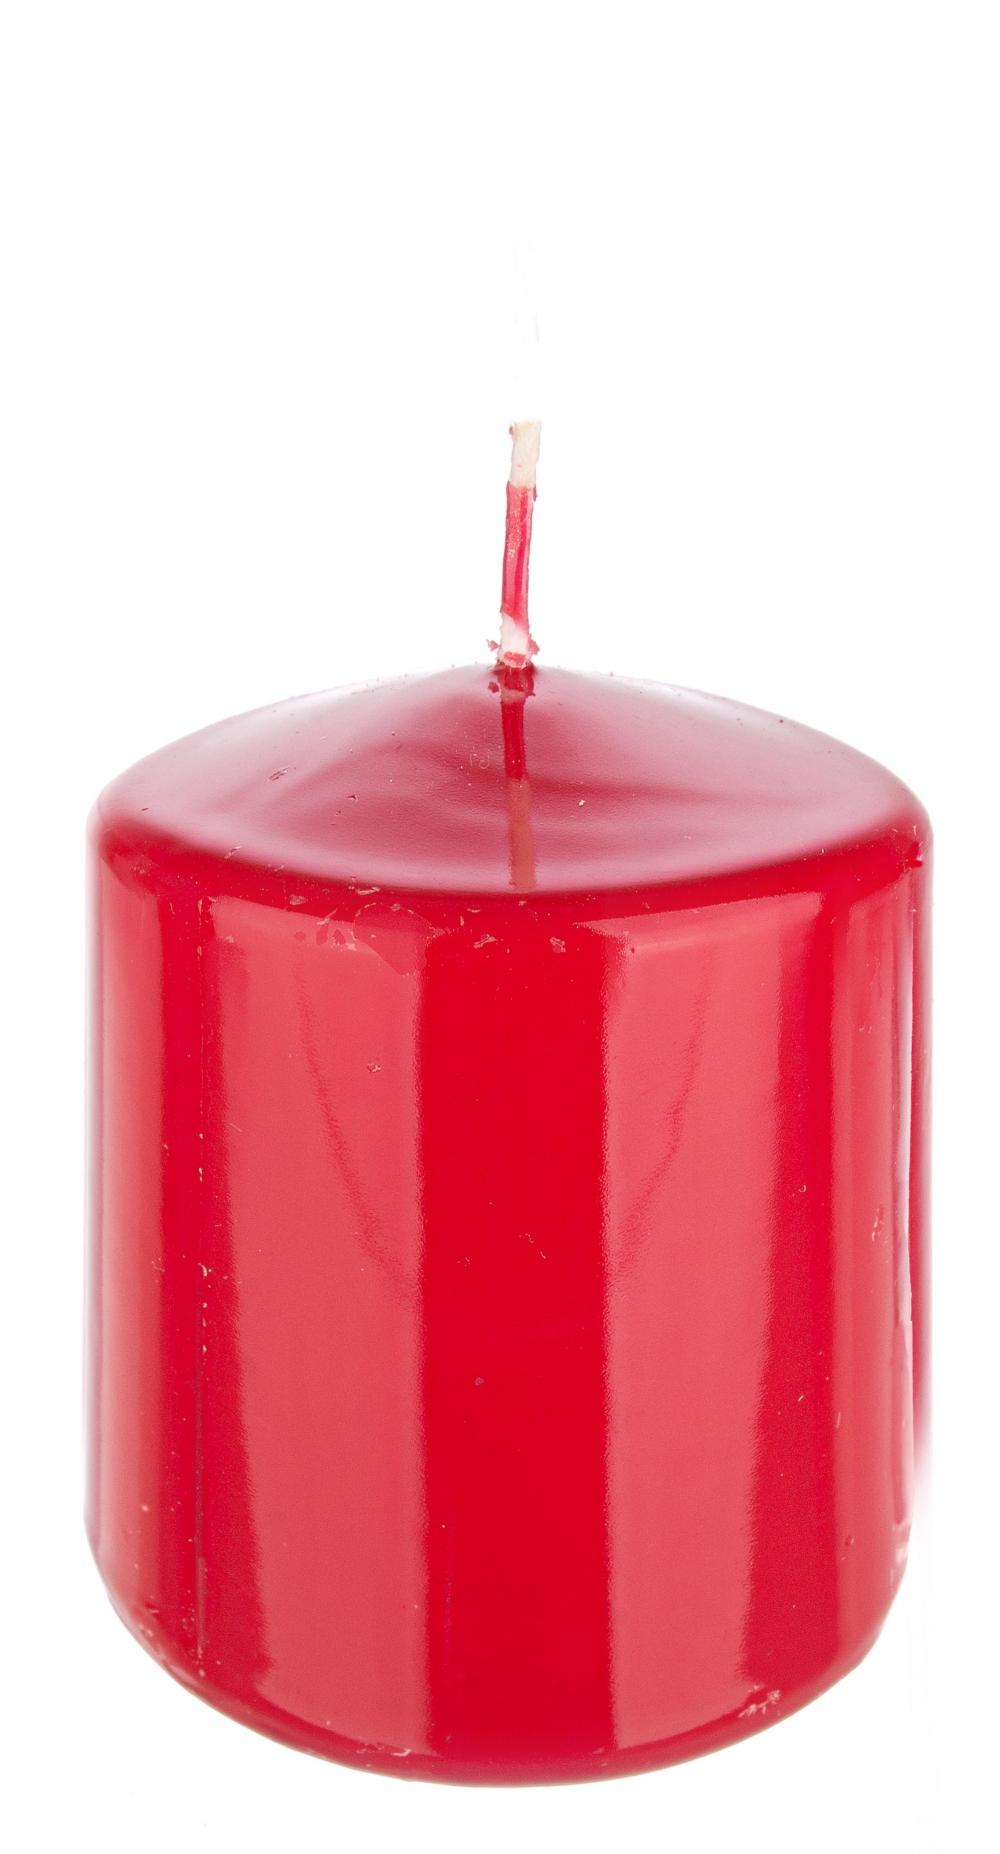 Lumanare Ruby rosu 6x8cm imagine 2021 insignis.ro